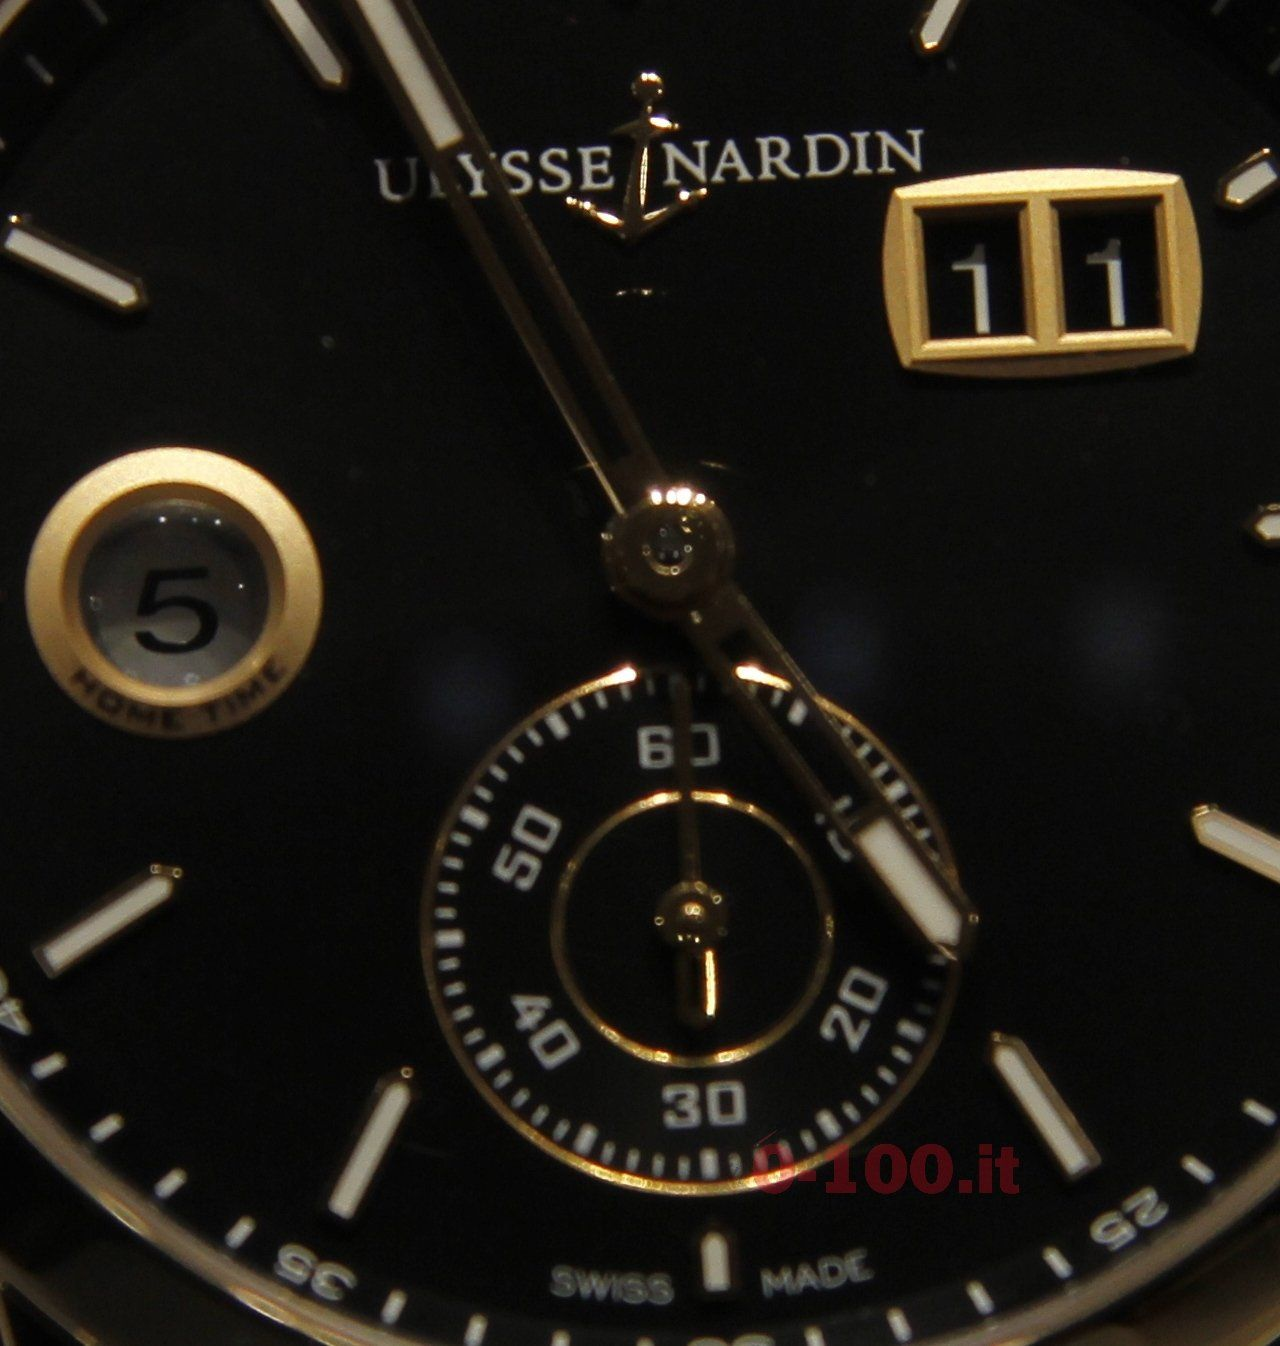 baselworld-2014-Ulysse Nardin Dual Time Manufacture_Ref_3346-126-91_0-10010